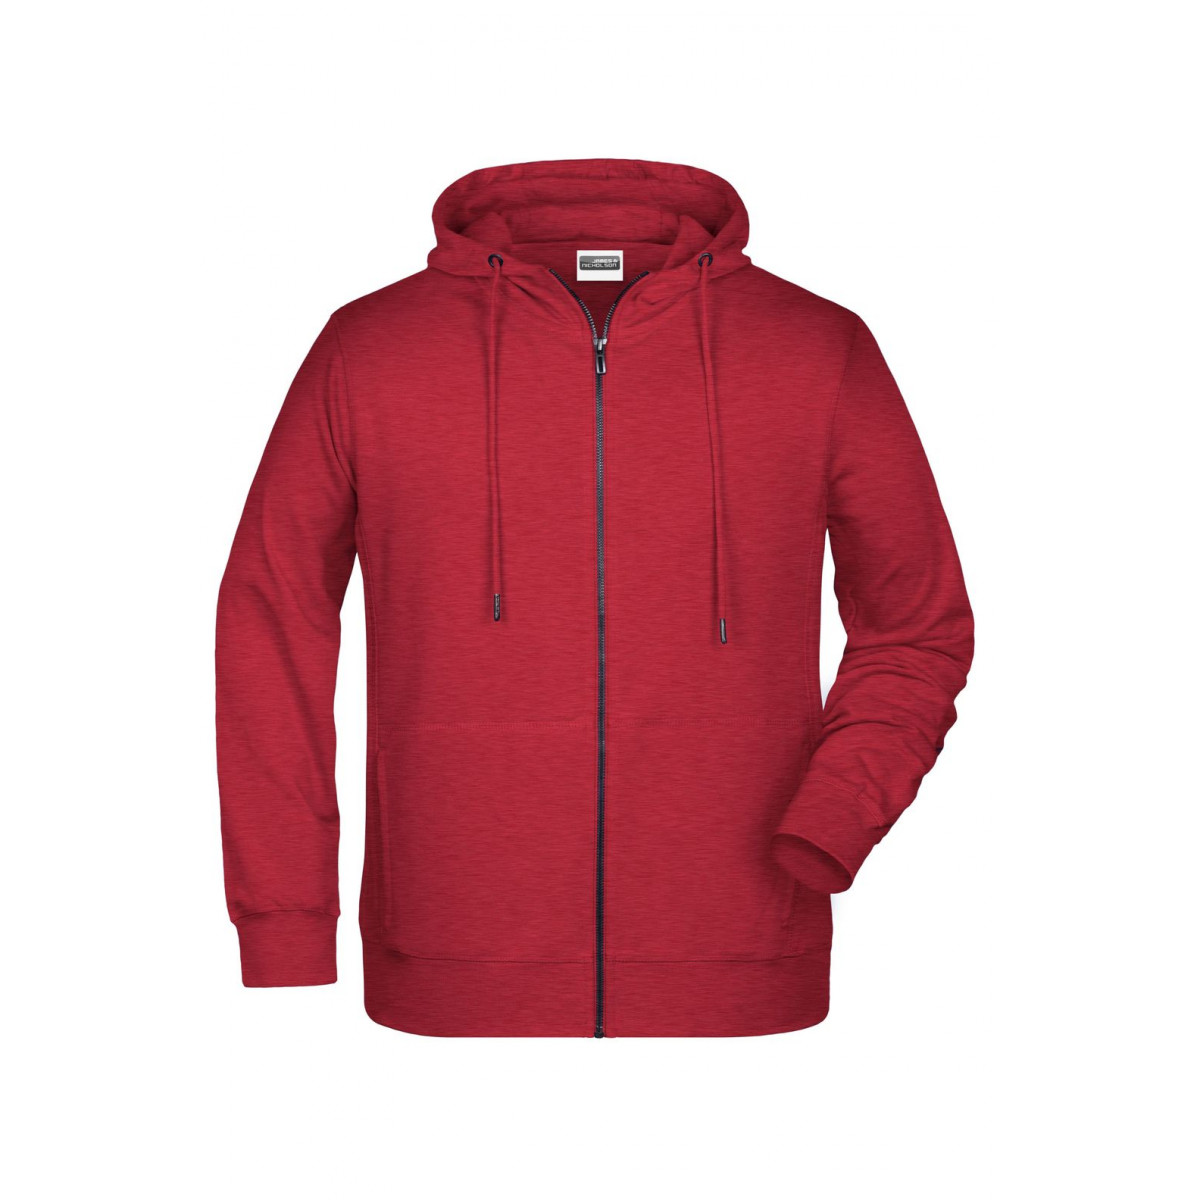 Толстовка мужская 8026 Mens Zip Hoody - Красный меланж